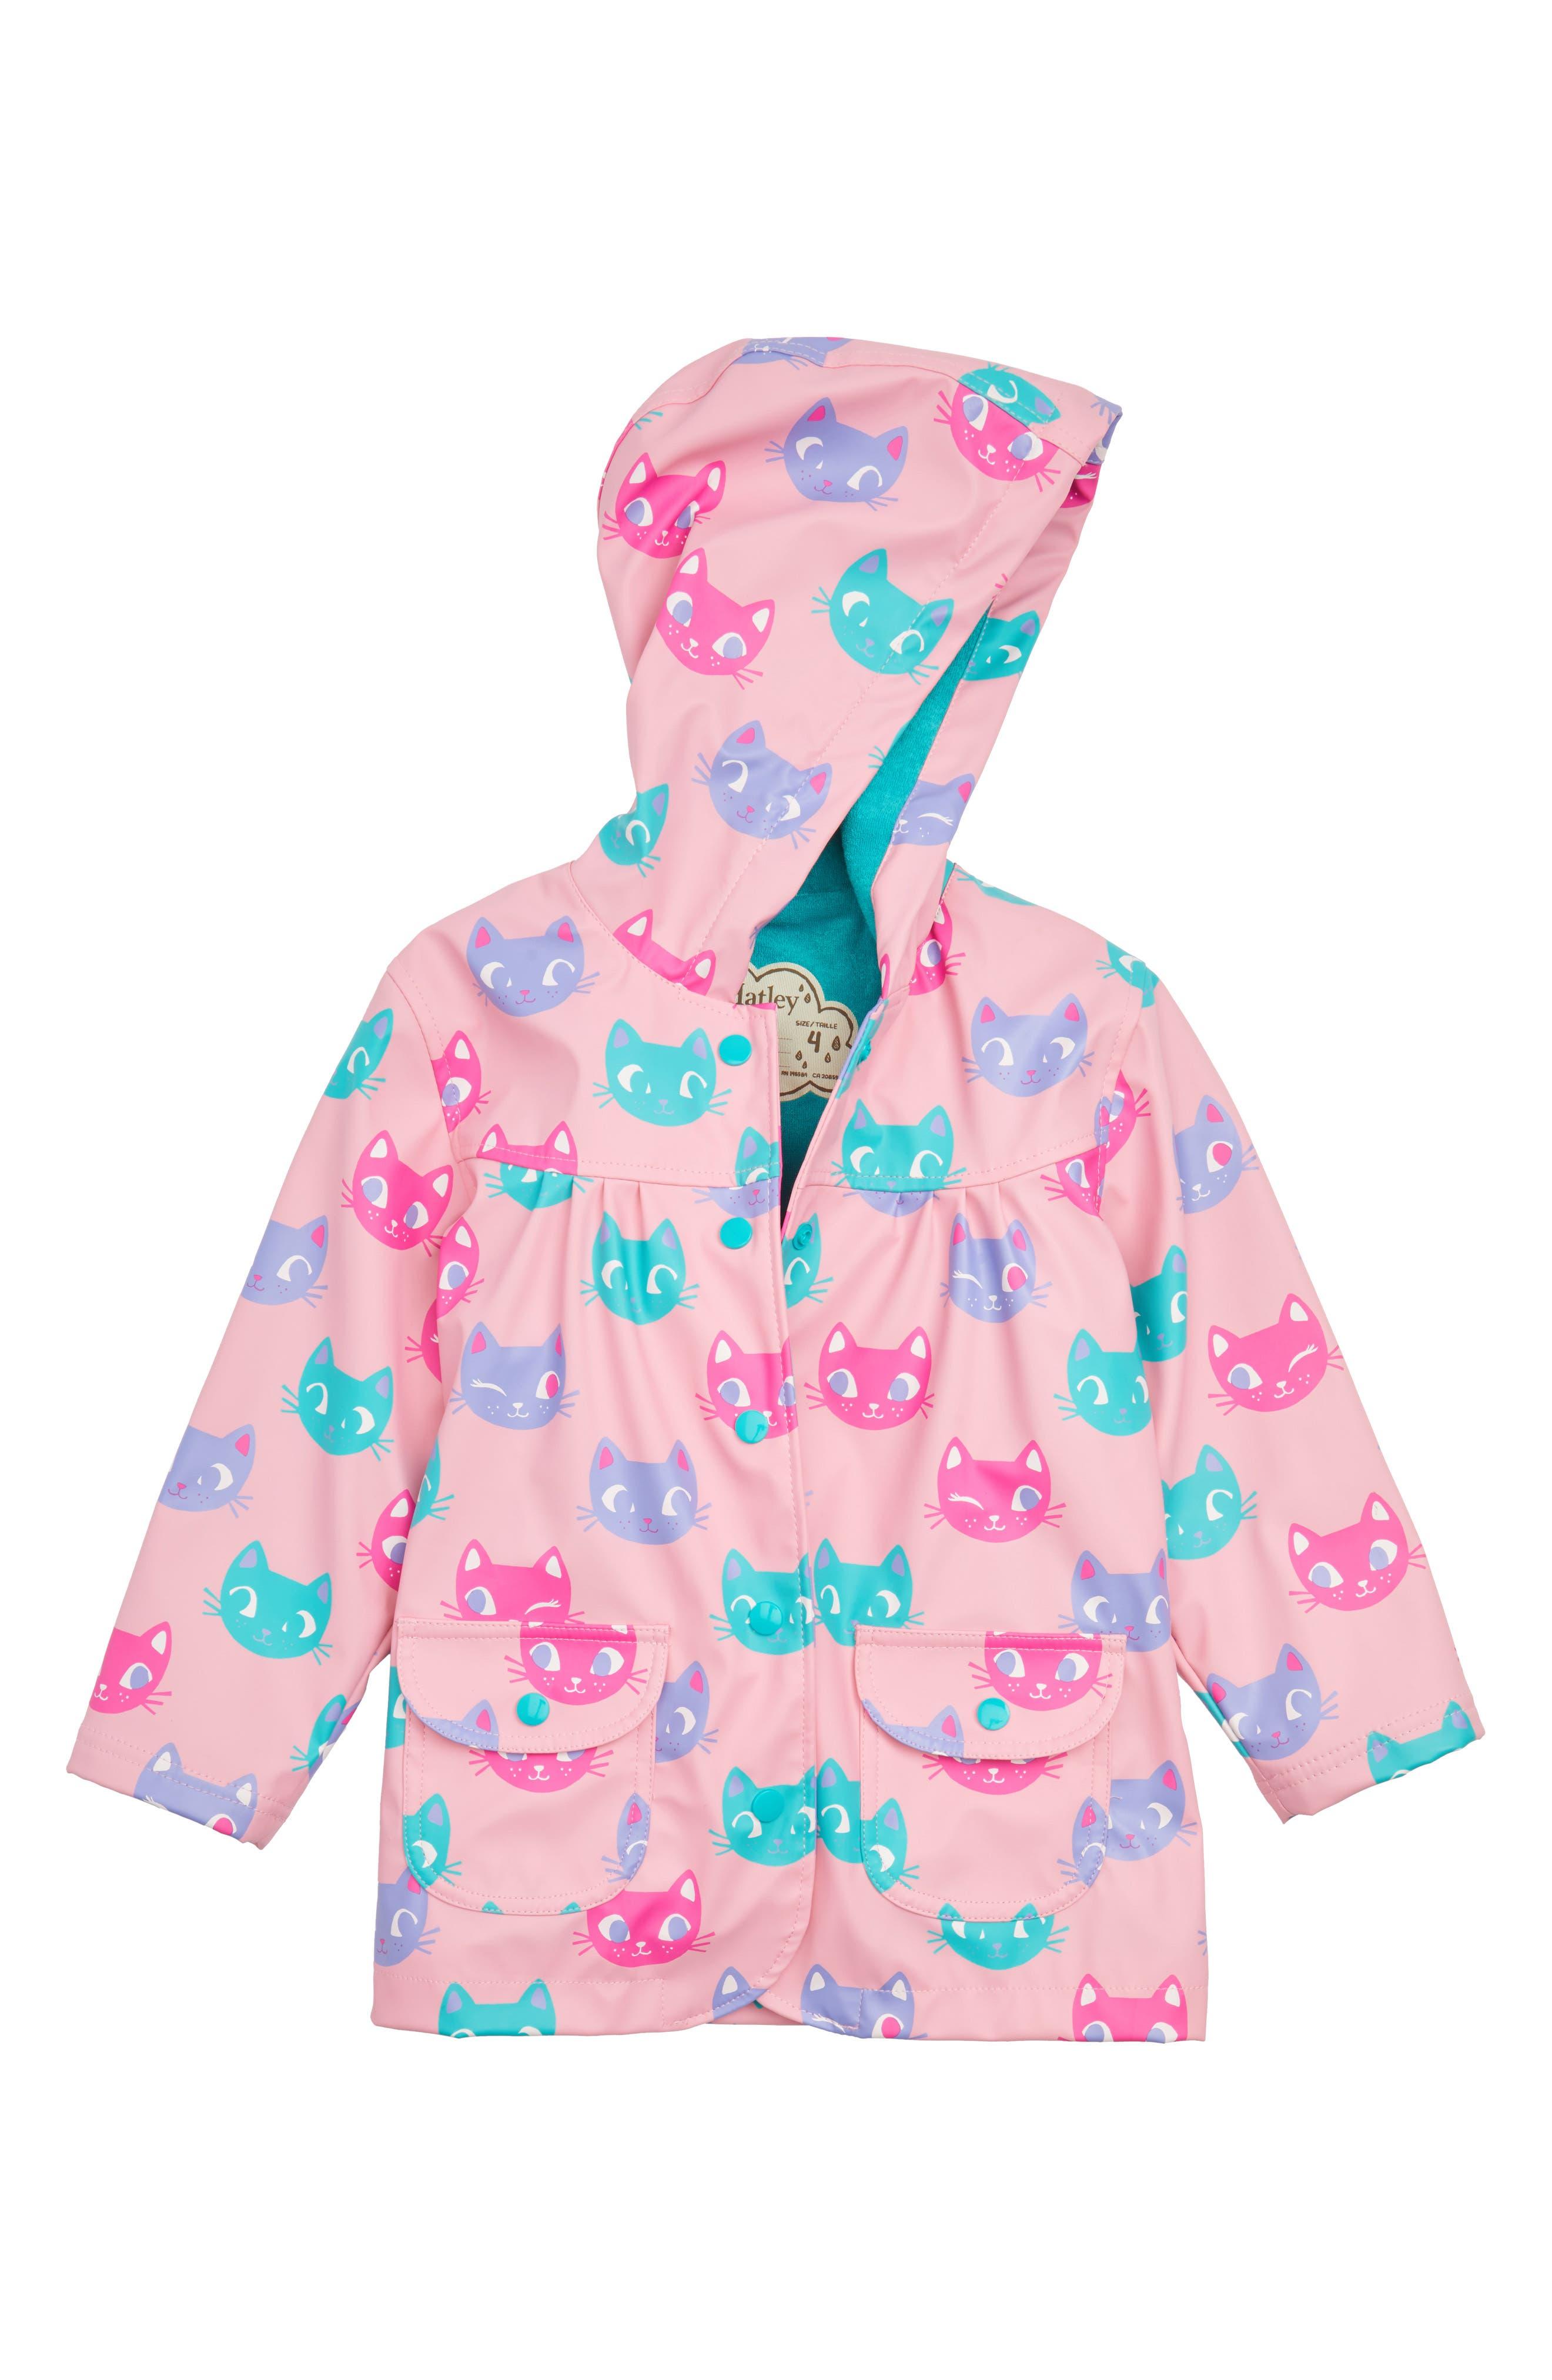 Silly Kitties Print Raincoat,                             Main thumbnail 1, color,                             550